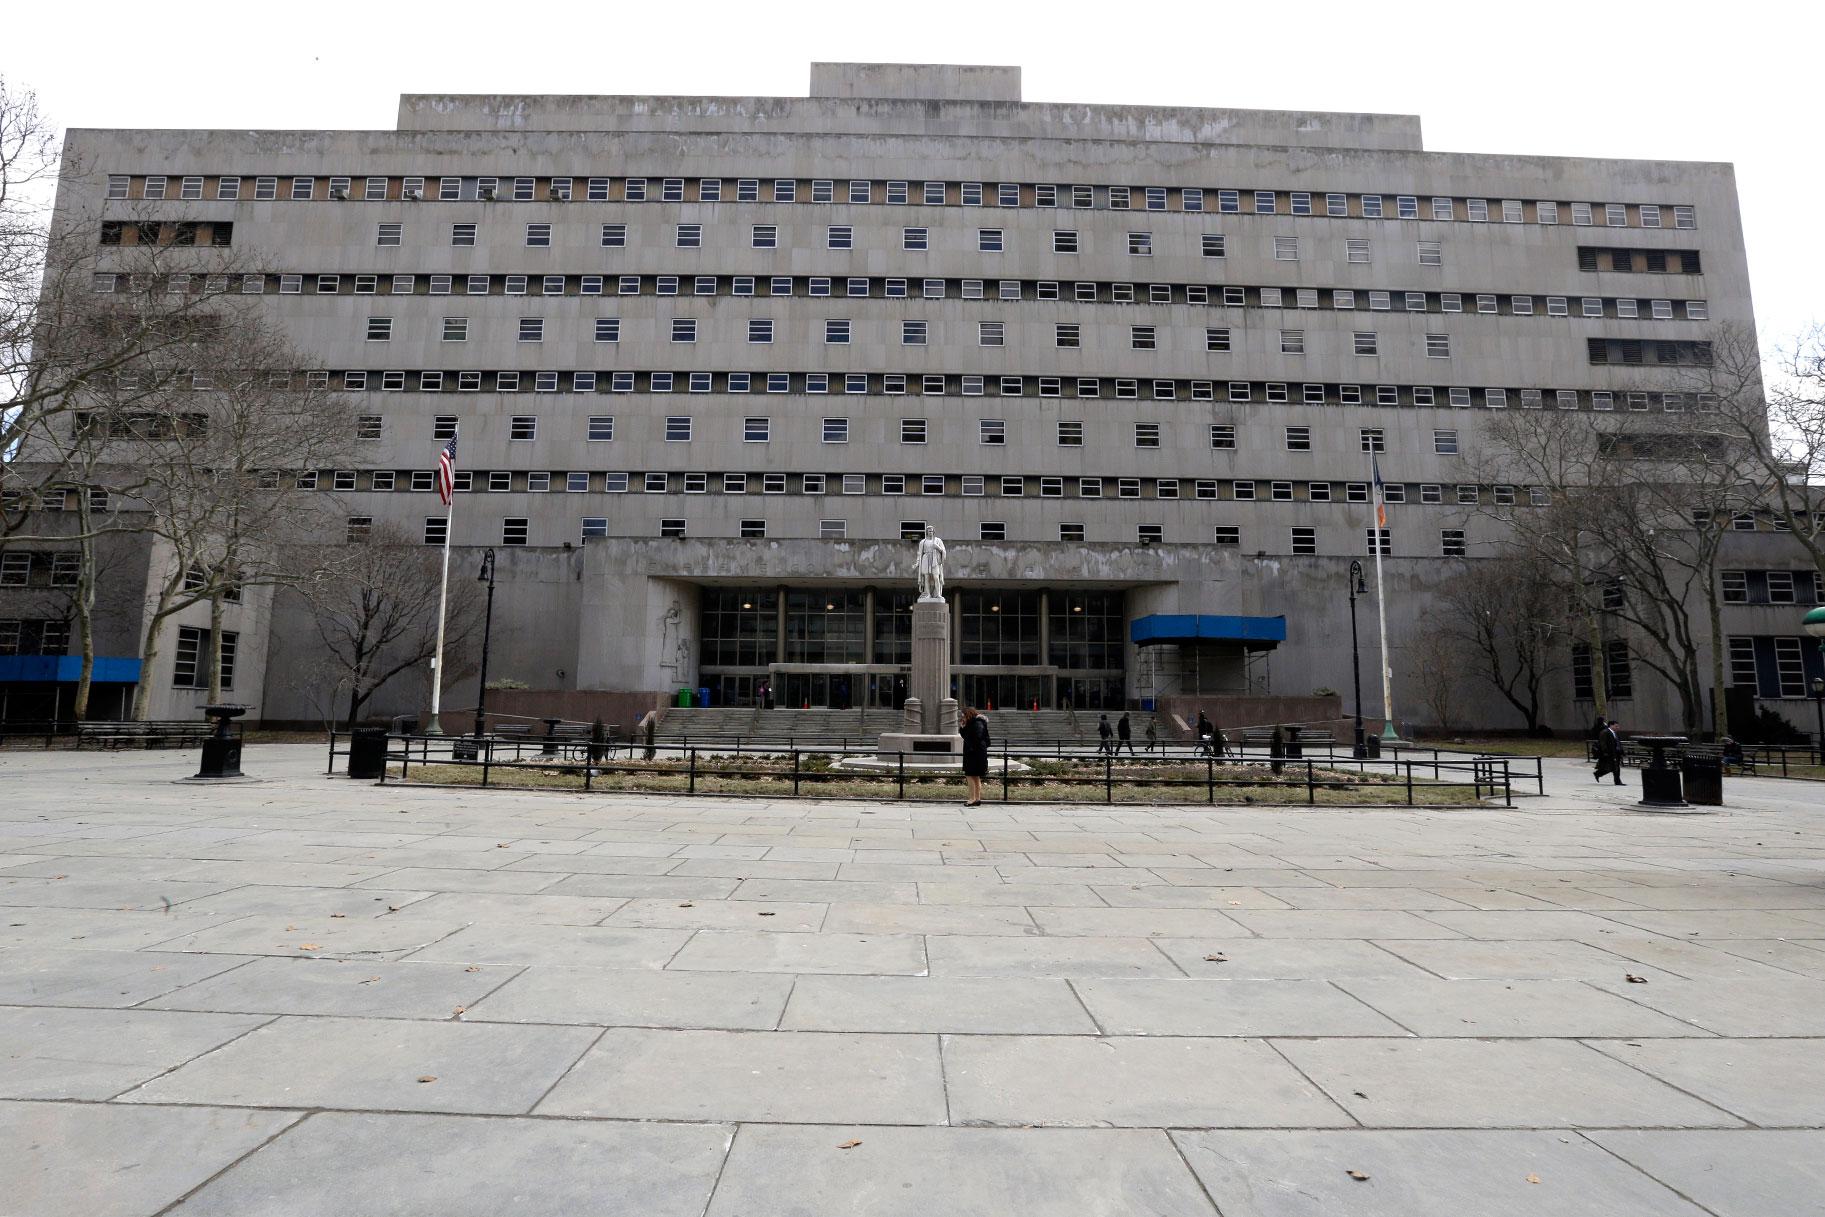 2 NYPD துப்பறியும் நபர்கள் பொலிஸ் வேனில் சந்தேகத்துடன் உடலுறவு கொள்வதை ஒப்புக்கொள்கிறார்கள்